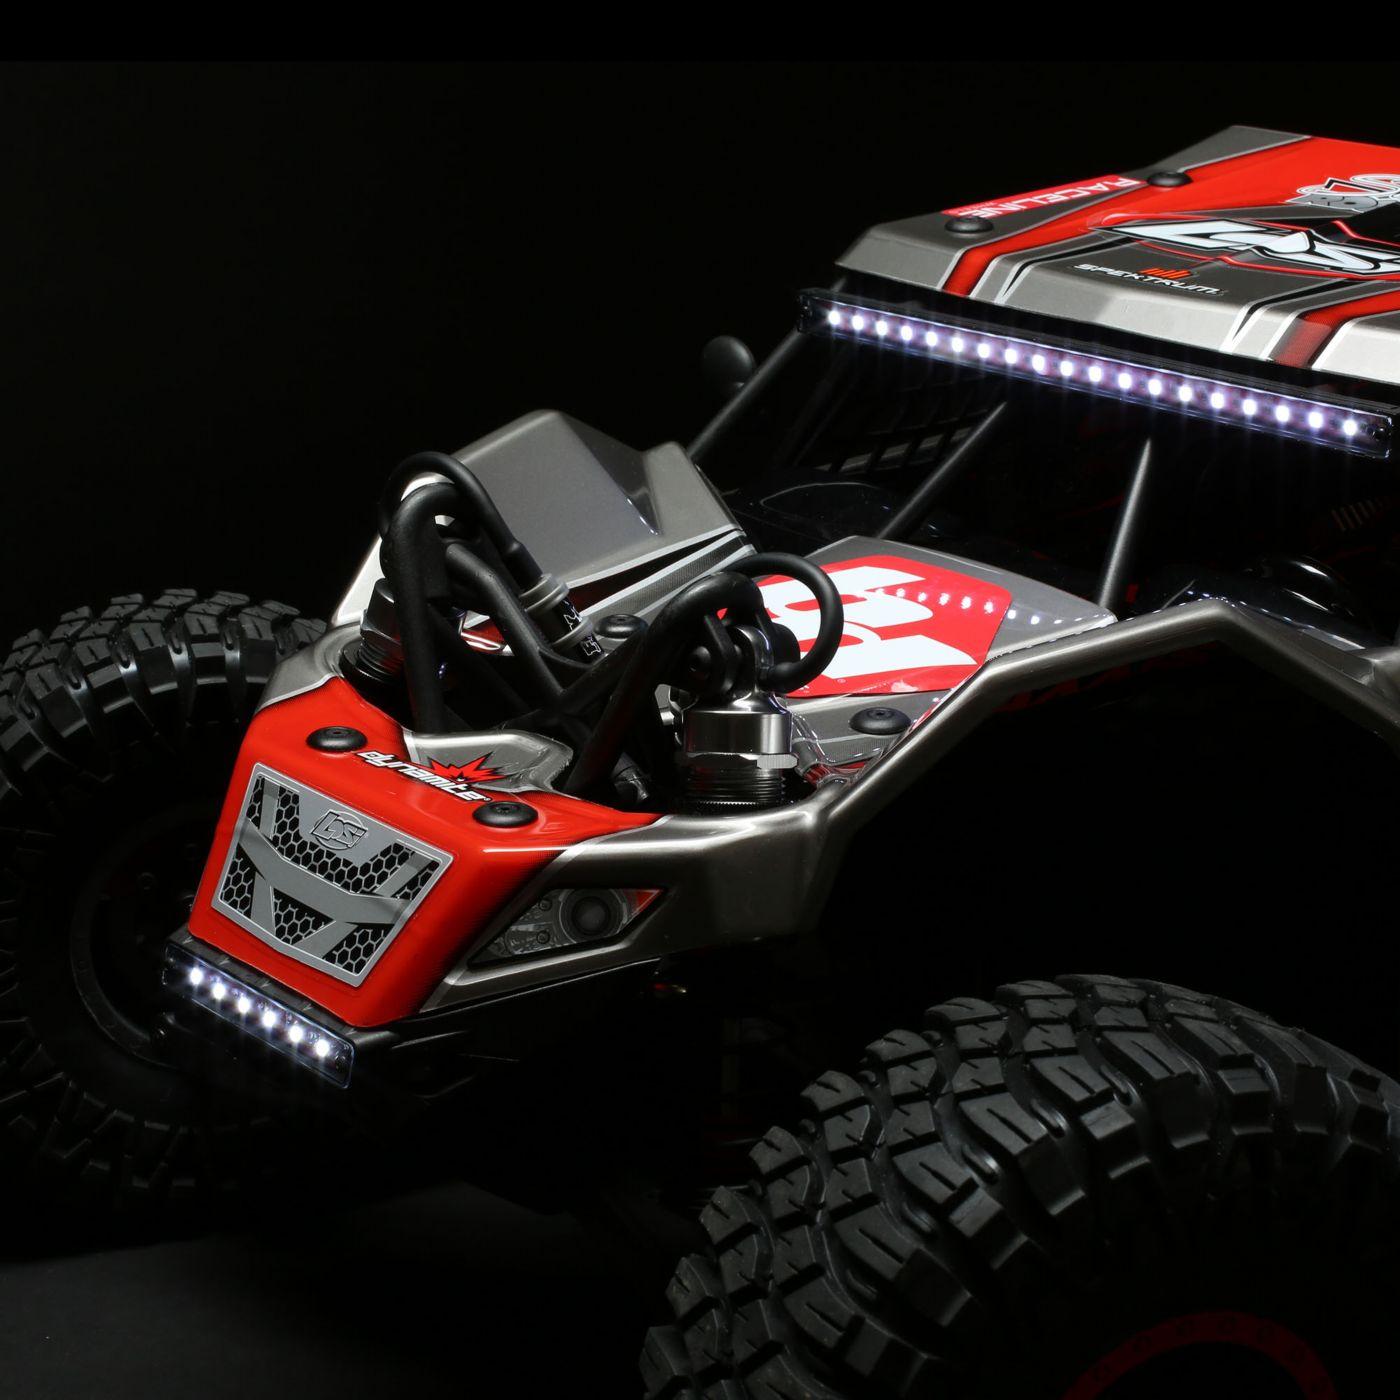 Losi Super Rock Rey Rock Racer brushless avc rtr 17